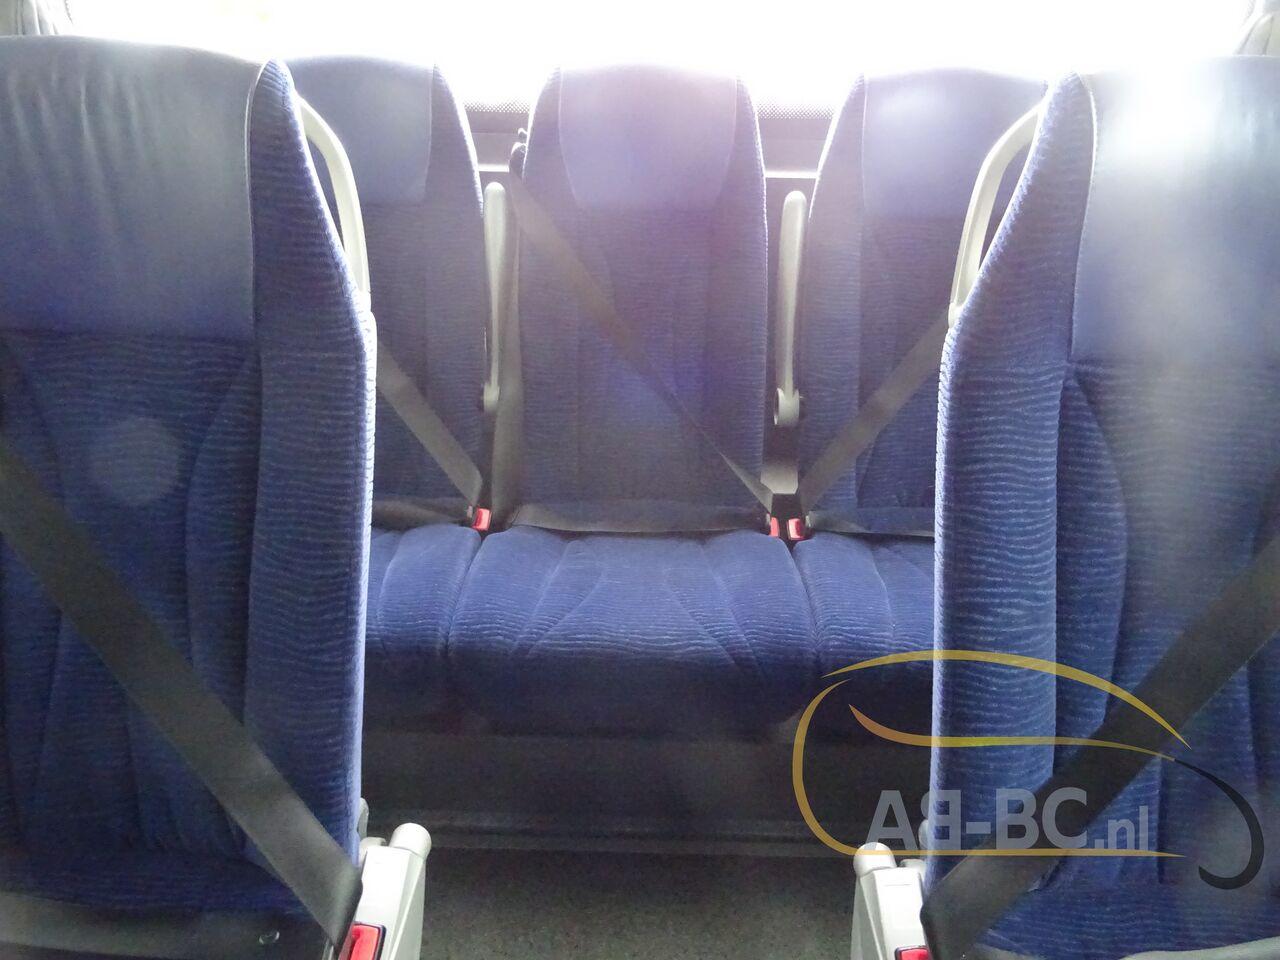 coach-busSETRA-S415-GT-HD-FINAL-EDITION---1627457264386998303_big_f3d85a29895c638c38caa46d3642f9af--21050713010665719300